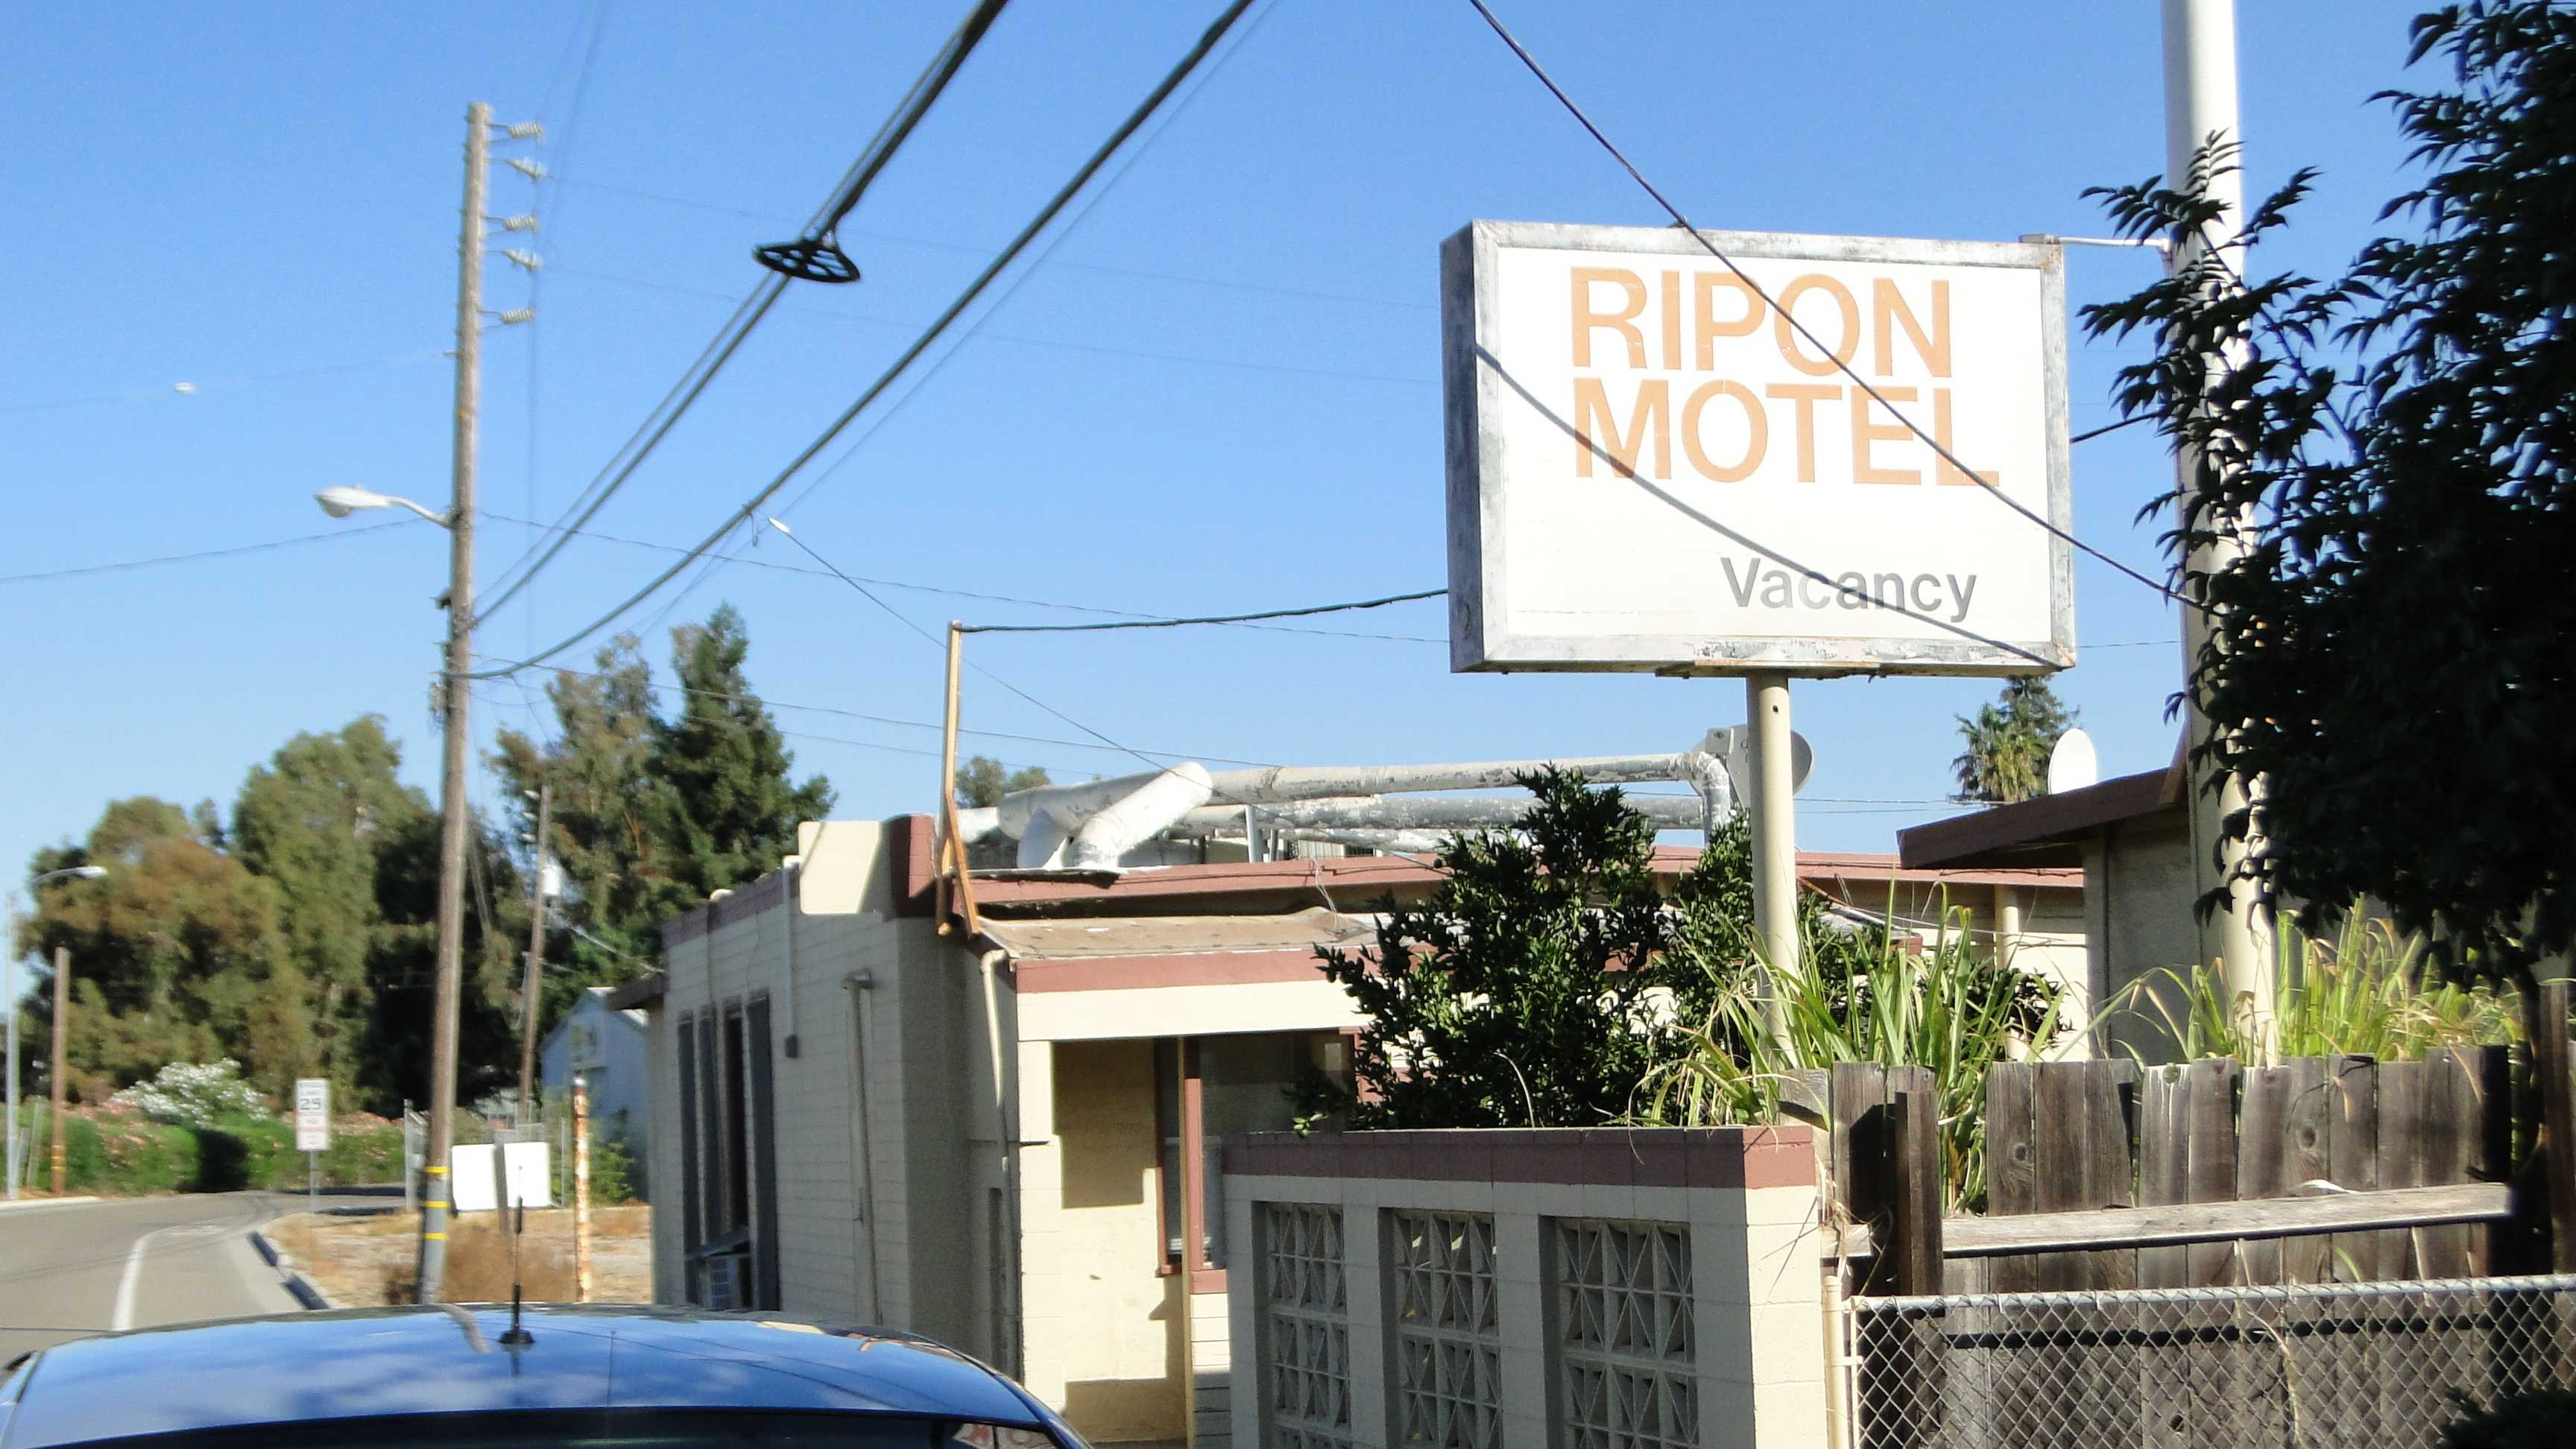 Ripon Motel